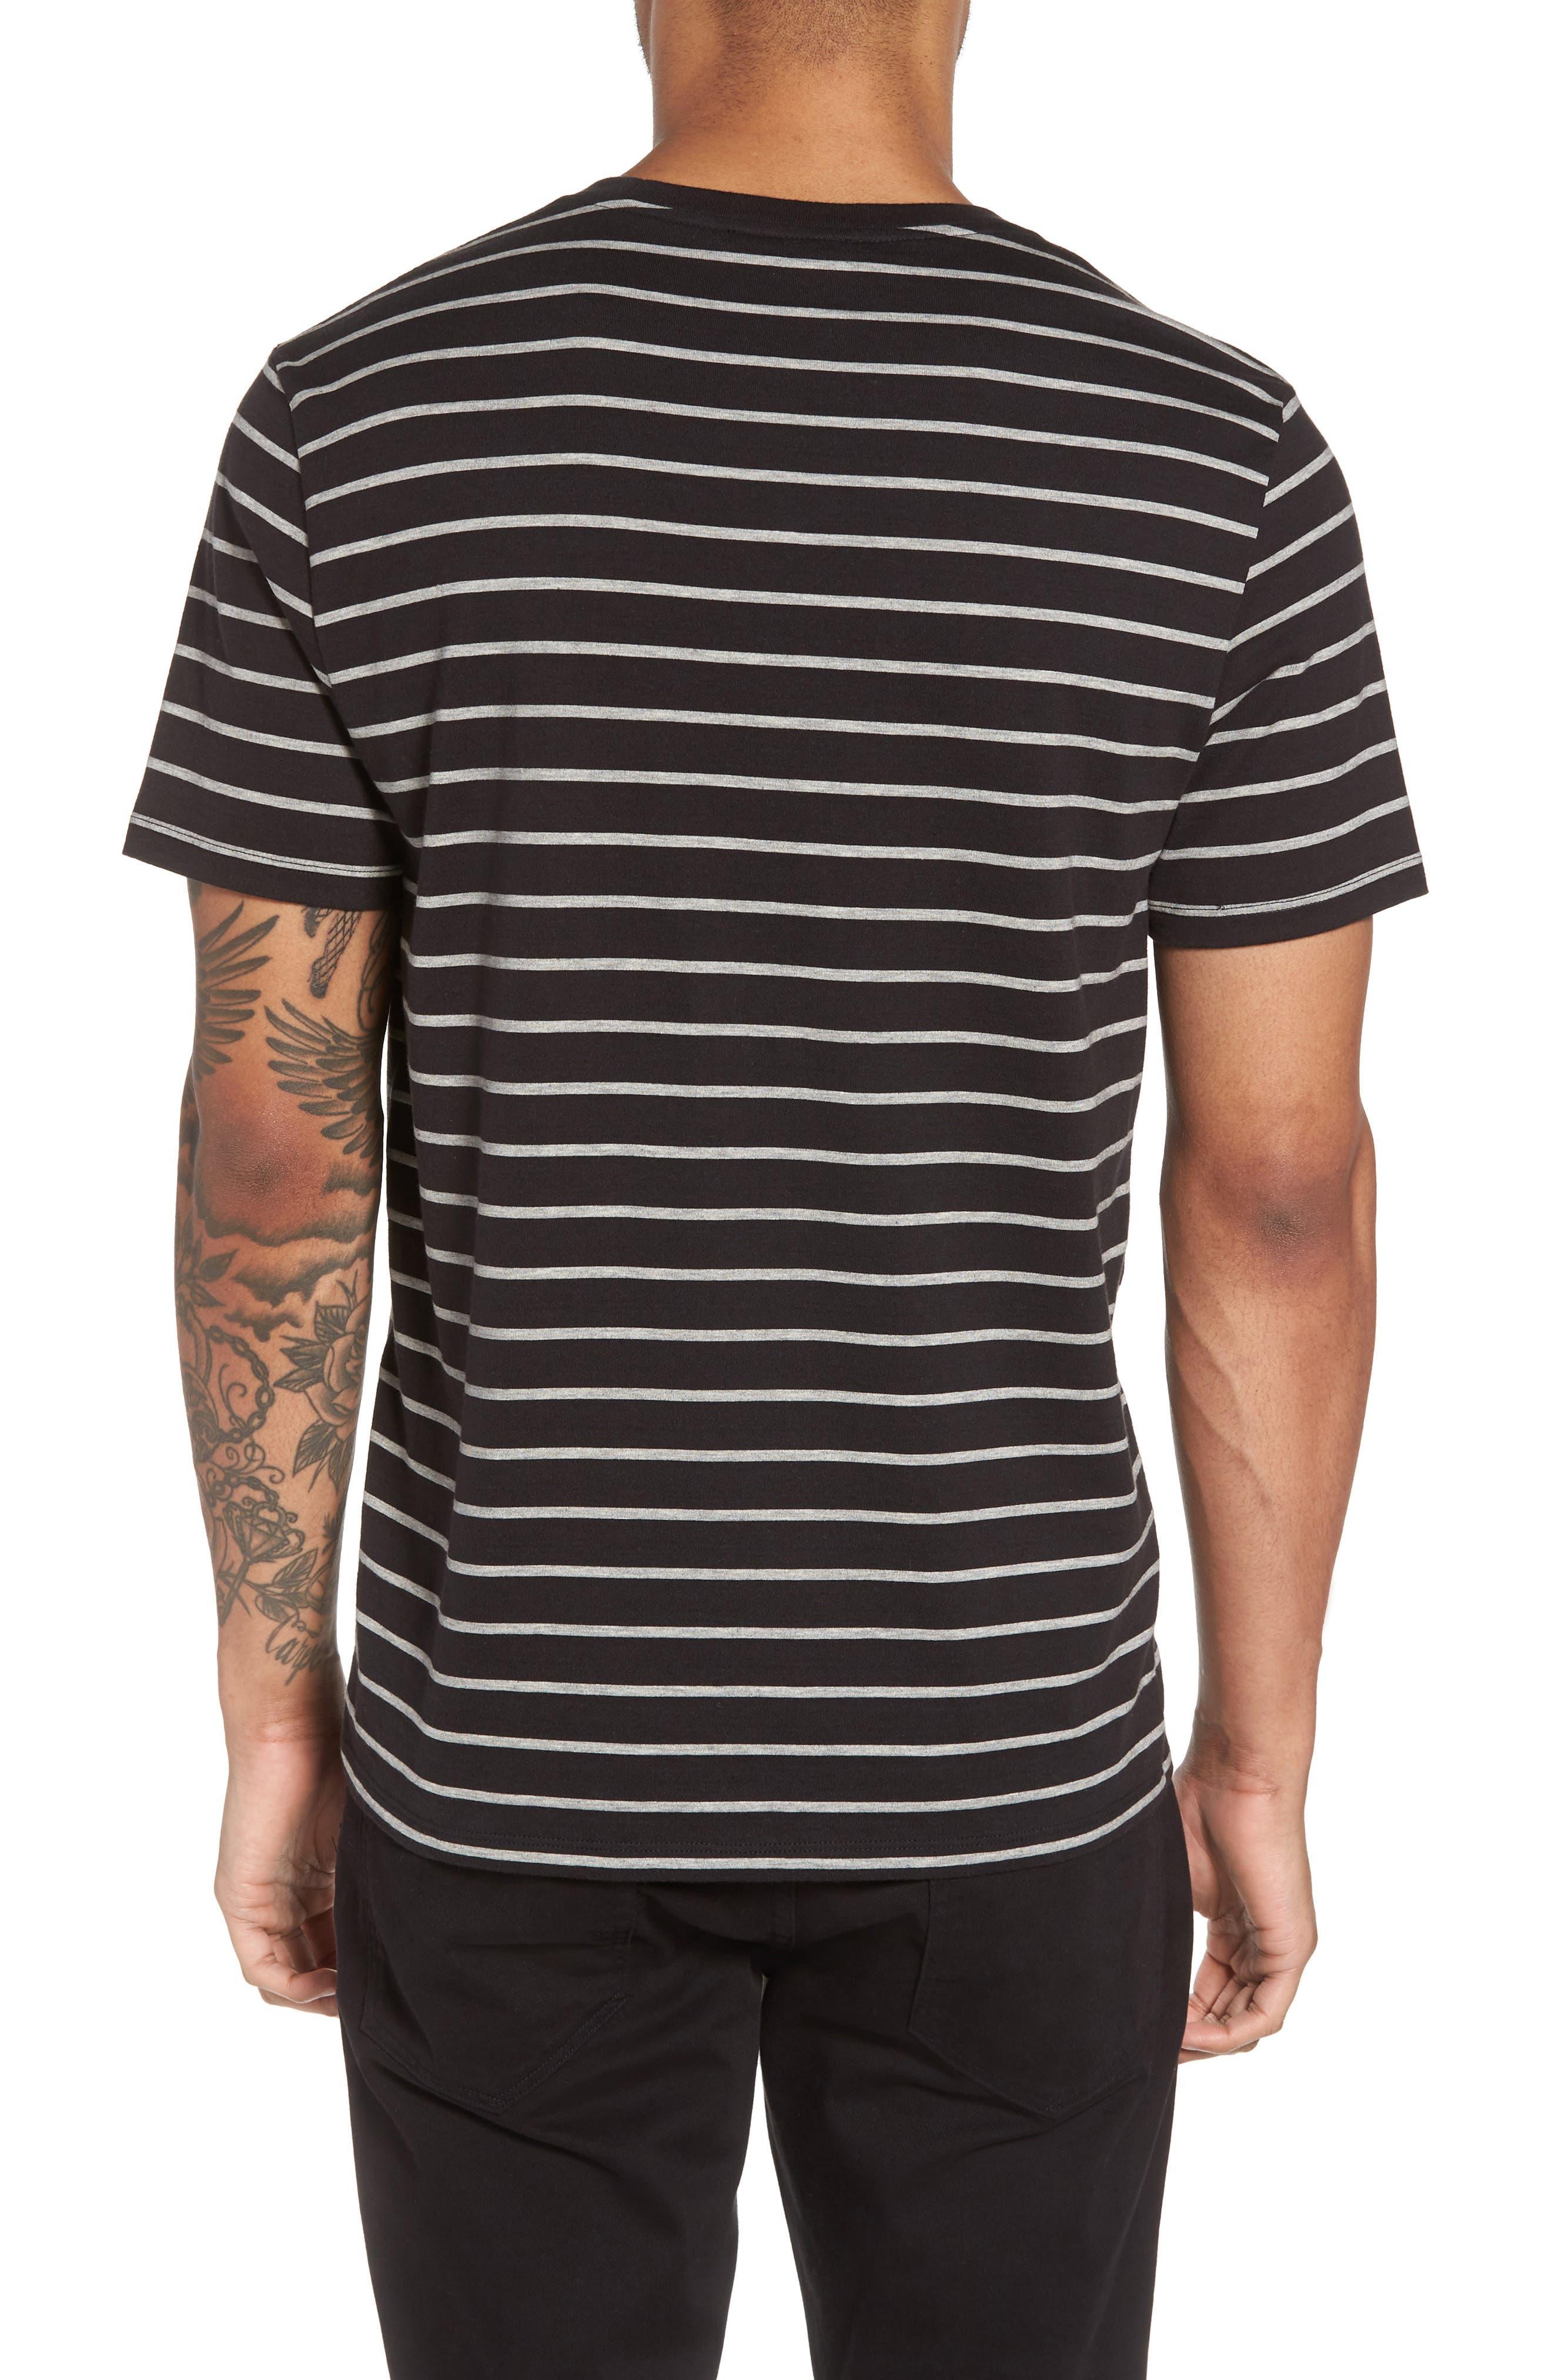 Slim Fit Heathered Stripe T-Shirt,                             Alternate thumbnail 2, color,                             Black/ Heather Steel